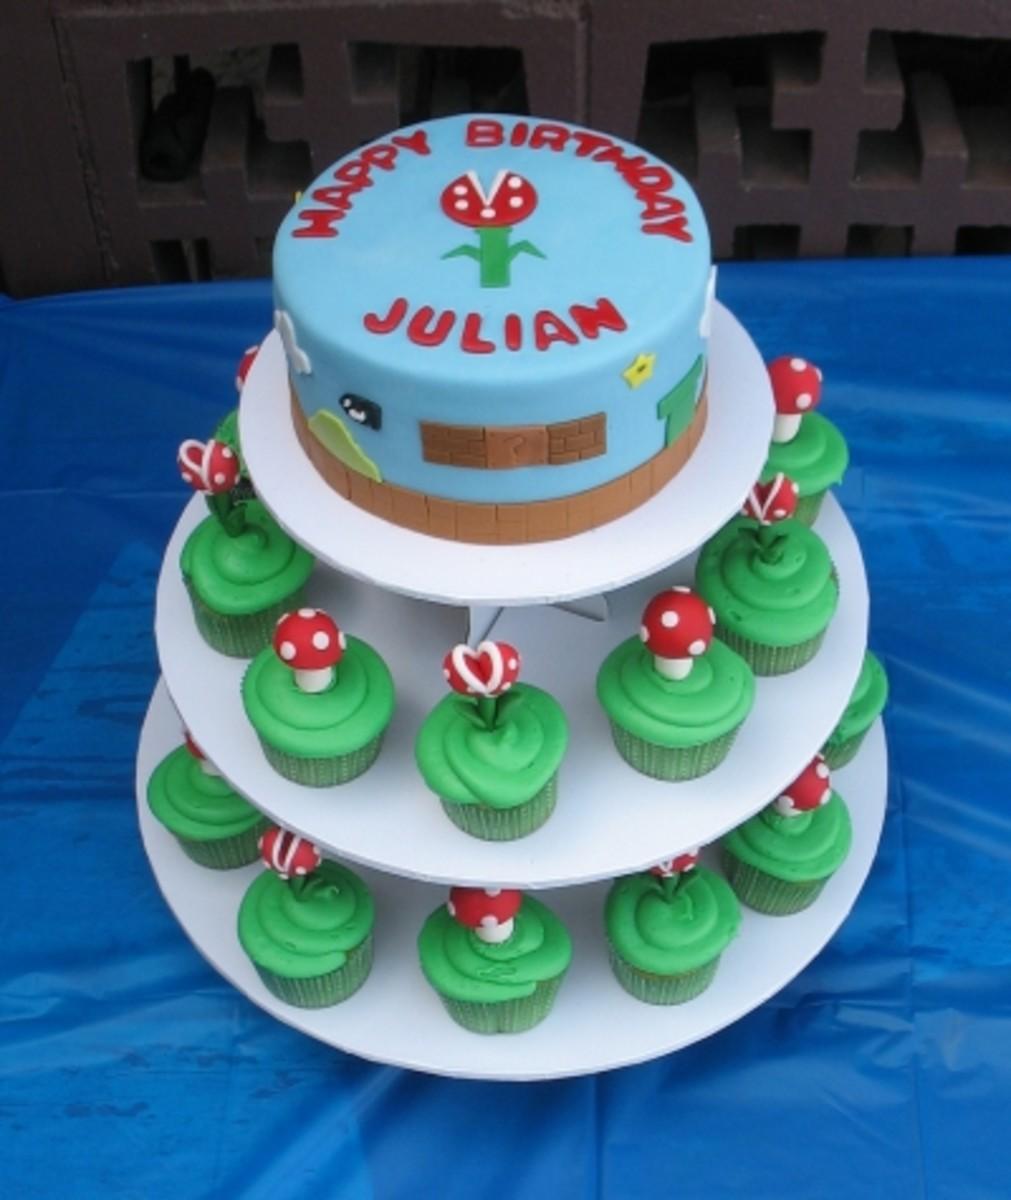 Awesome Super Mario Cake and Cupcake Tower!